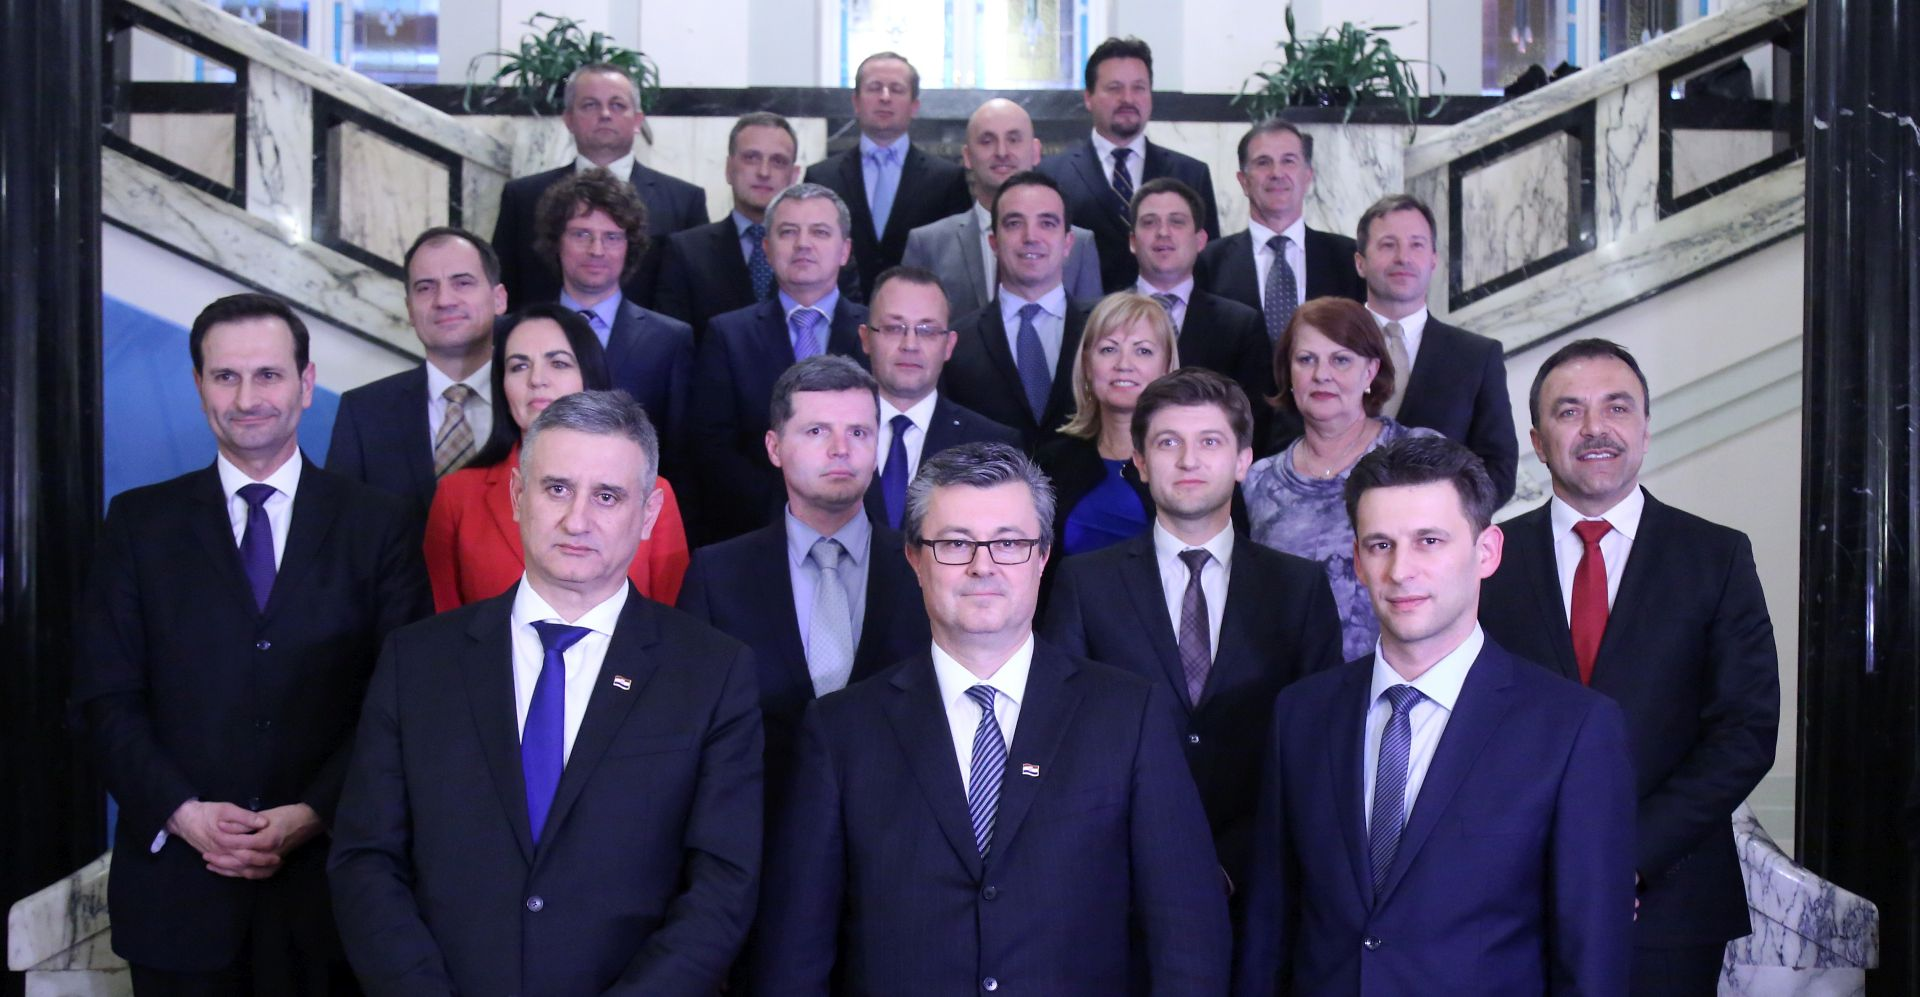 NAKON MARATONSKE RASPRAVE Hrvatska dobila 13. vladu od neovisnosti